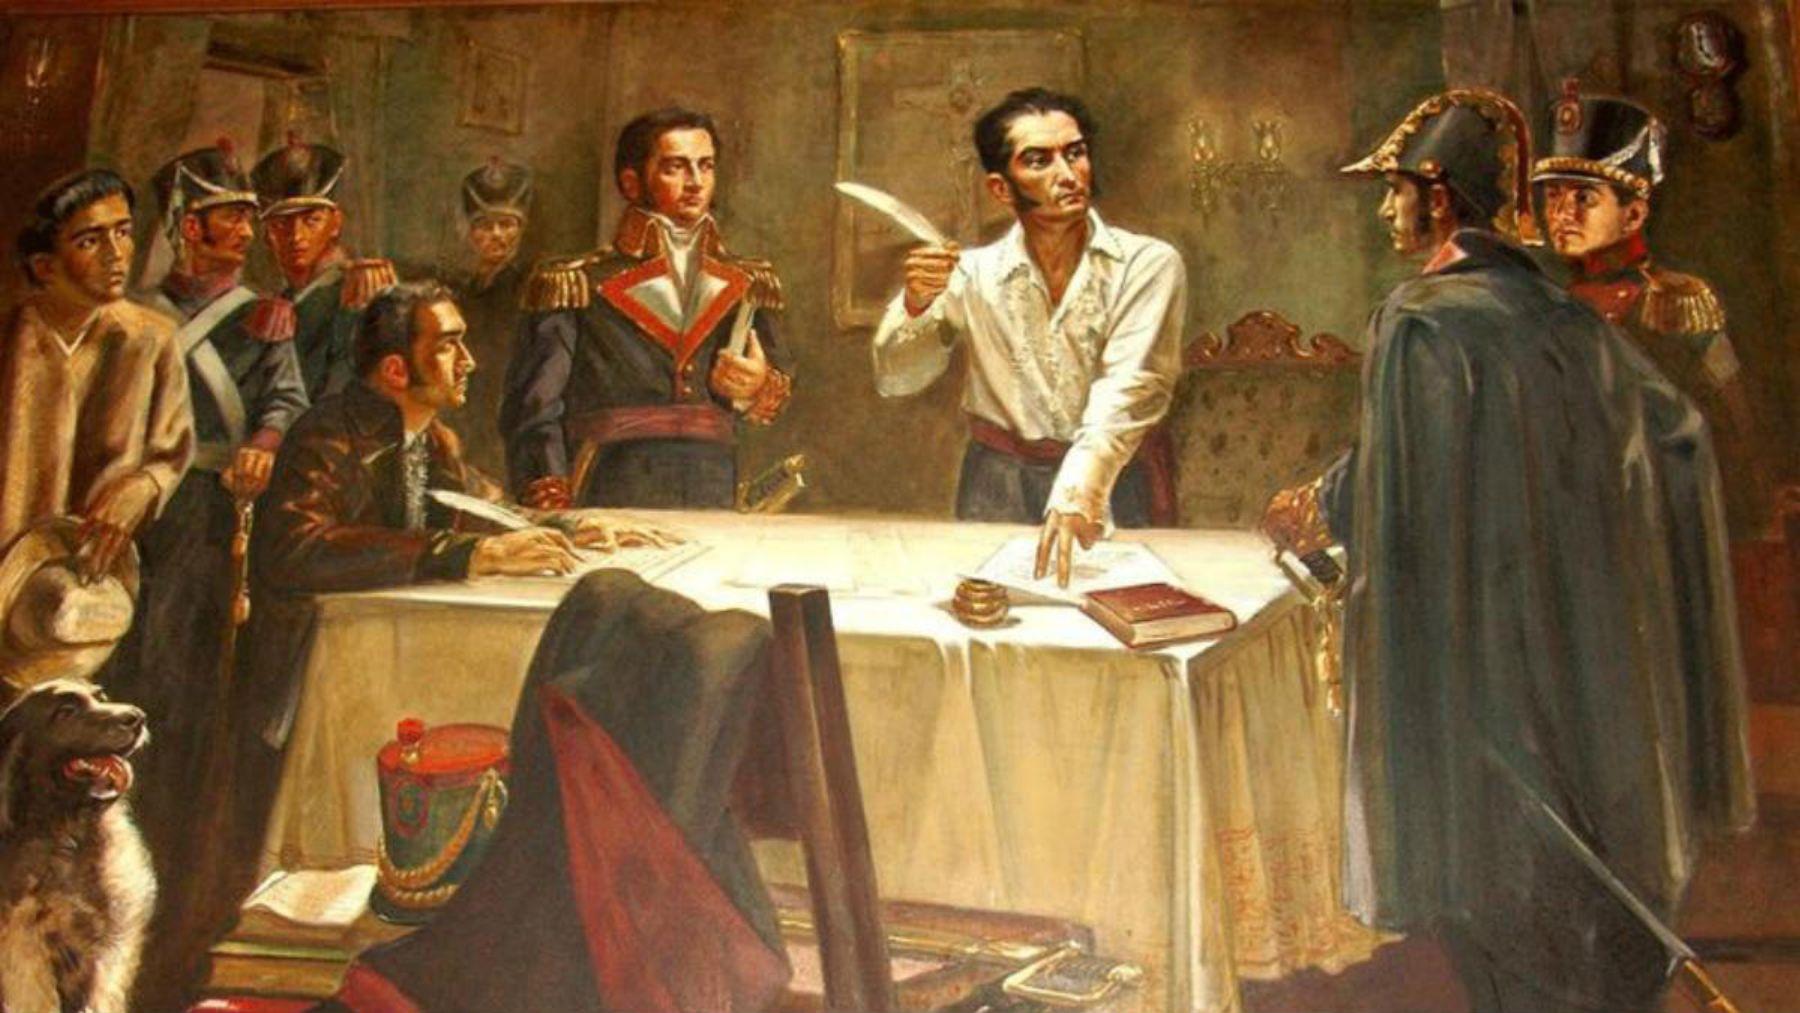 Las mejores frases de Simón Bolívar